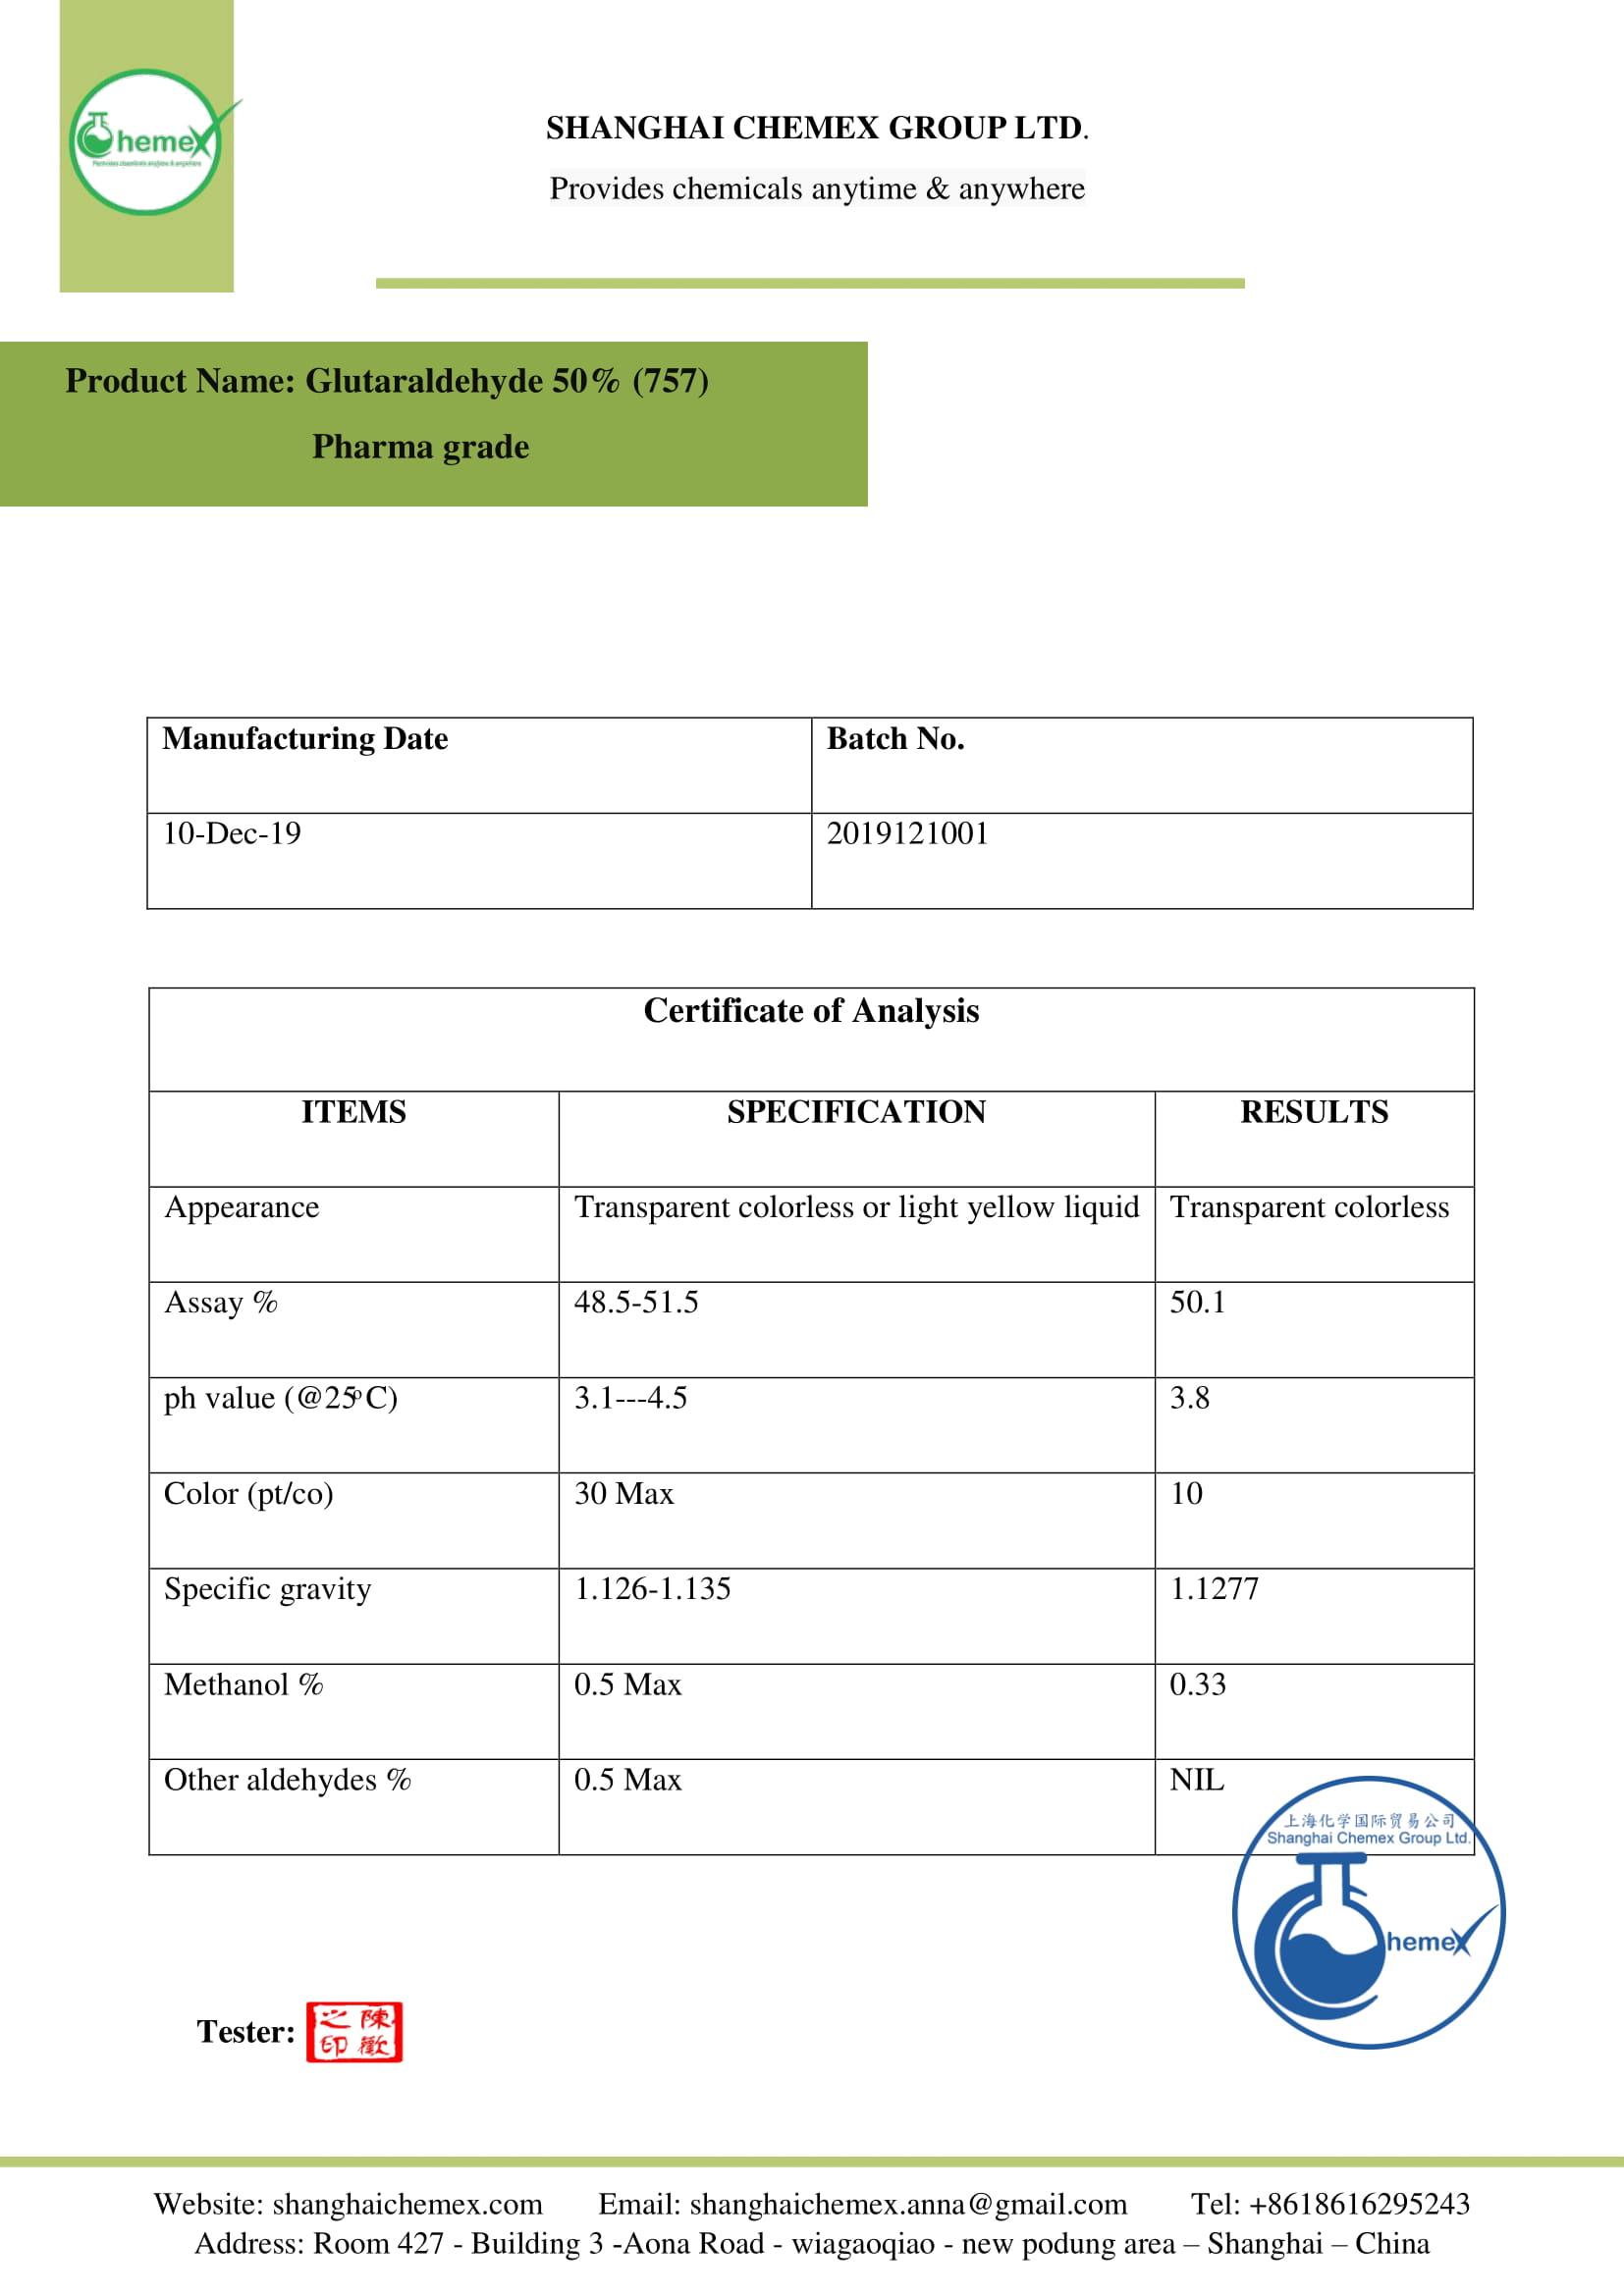 Pharma grade Glutaraldehyde COA